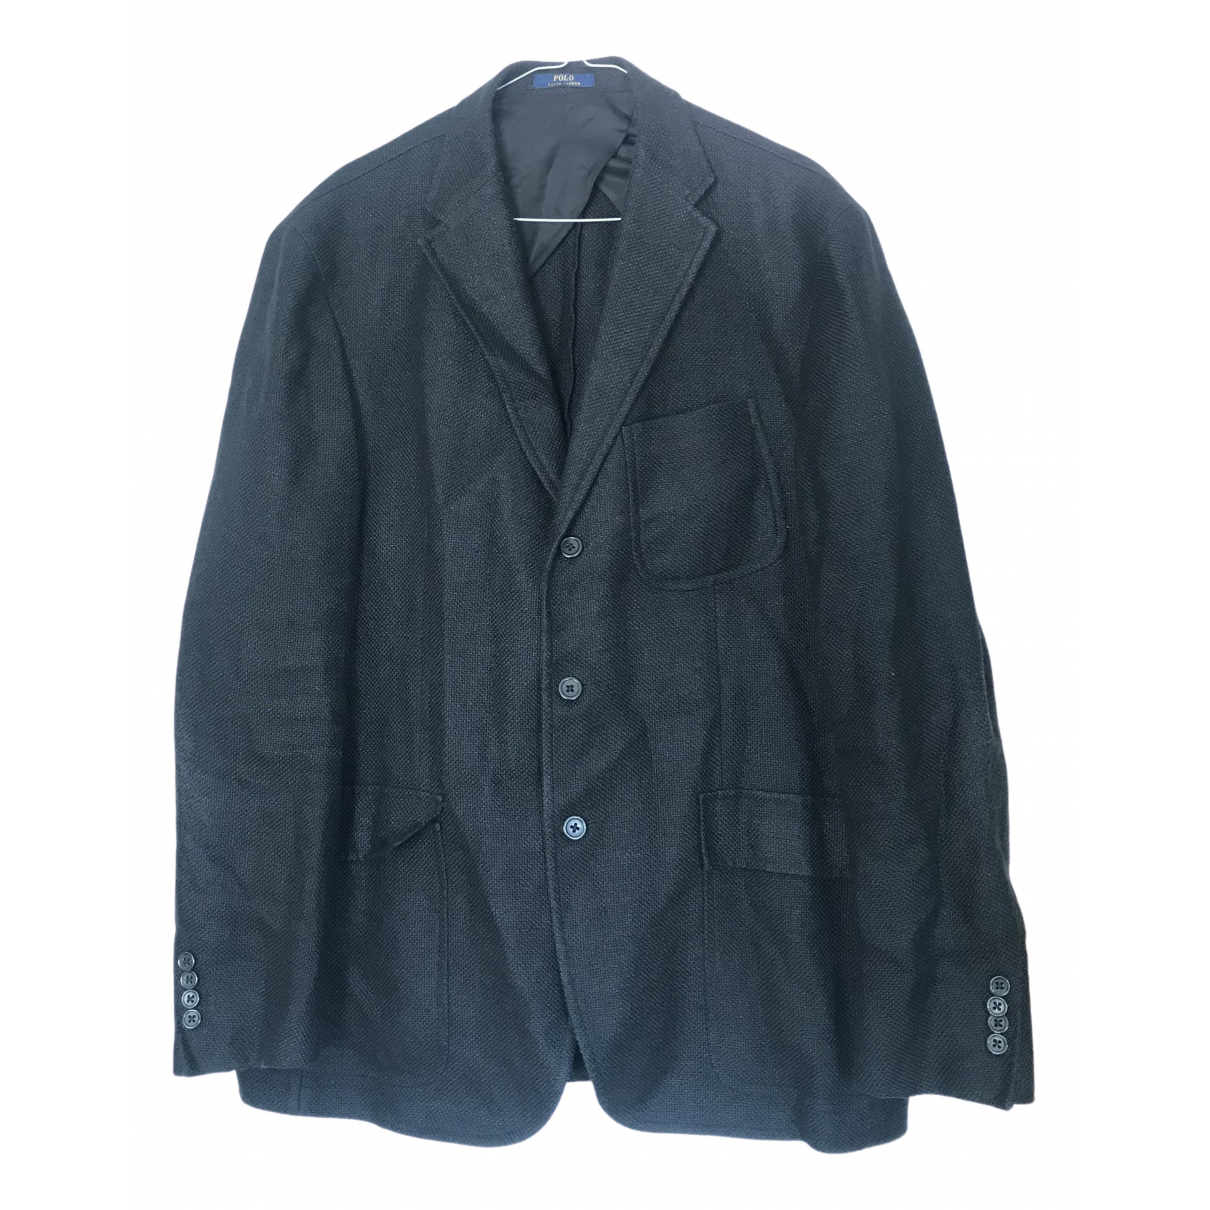 Polo Ralph Lauren \N Black Linen jacket  for Men 44 UK - US